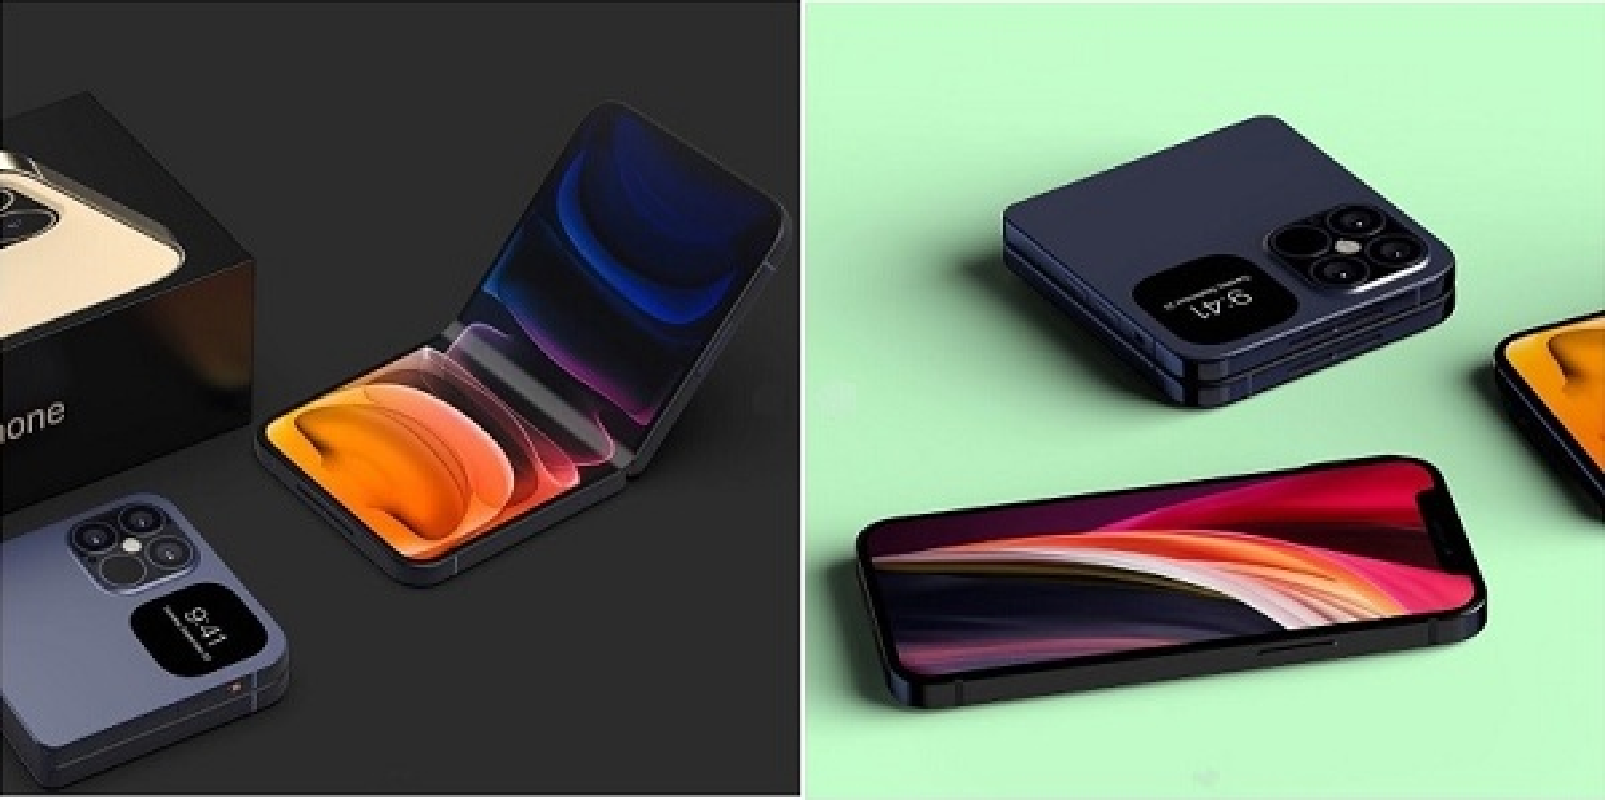 Xuat hien hinh anh iPhone Fold man hinh gap dep het nac-Hinh-3